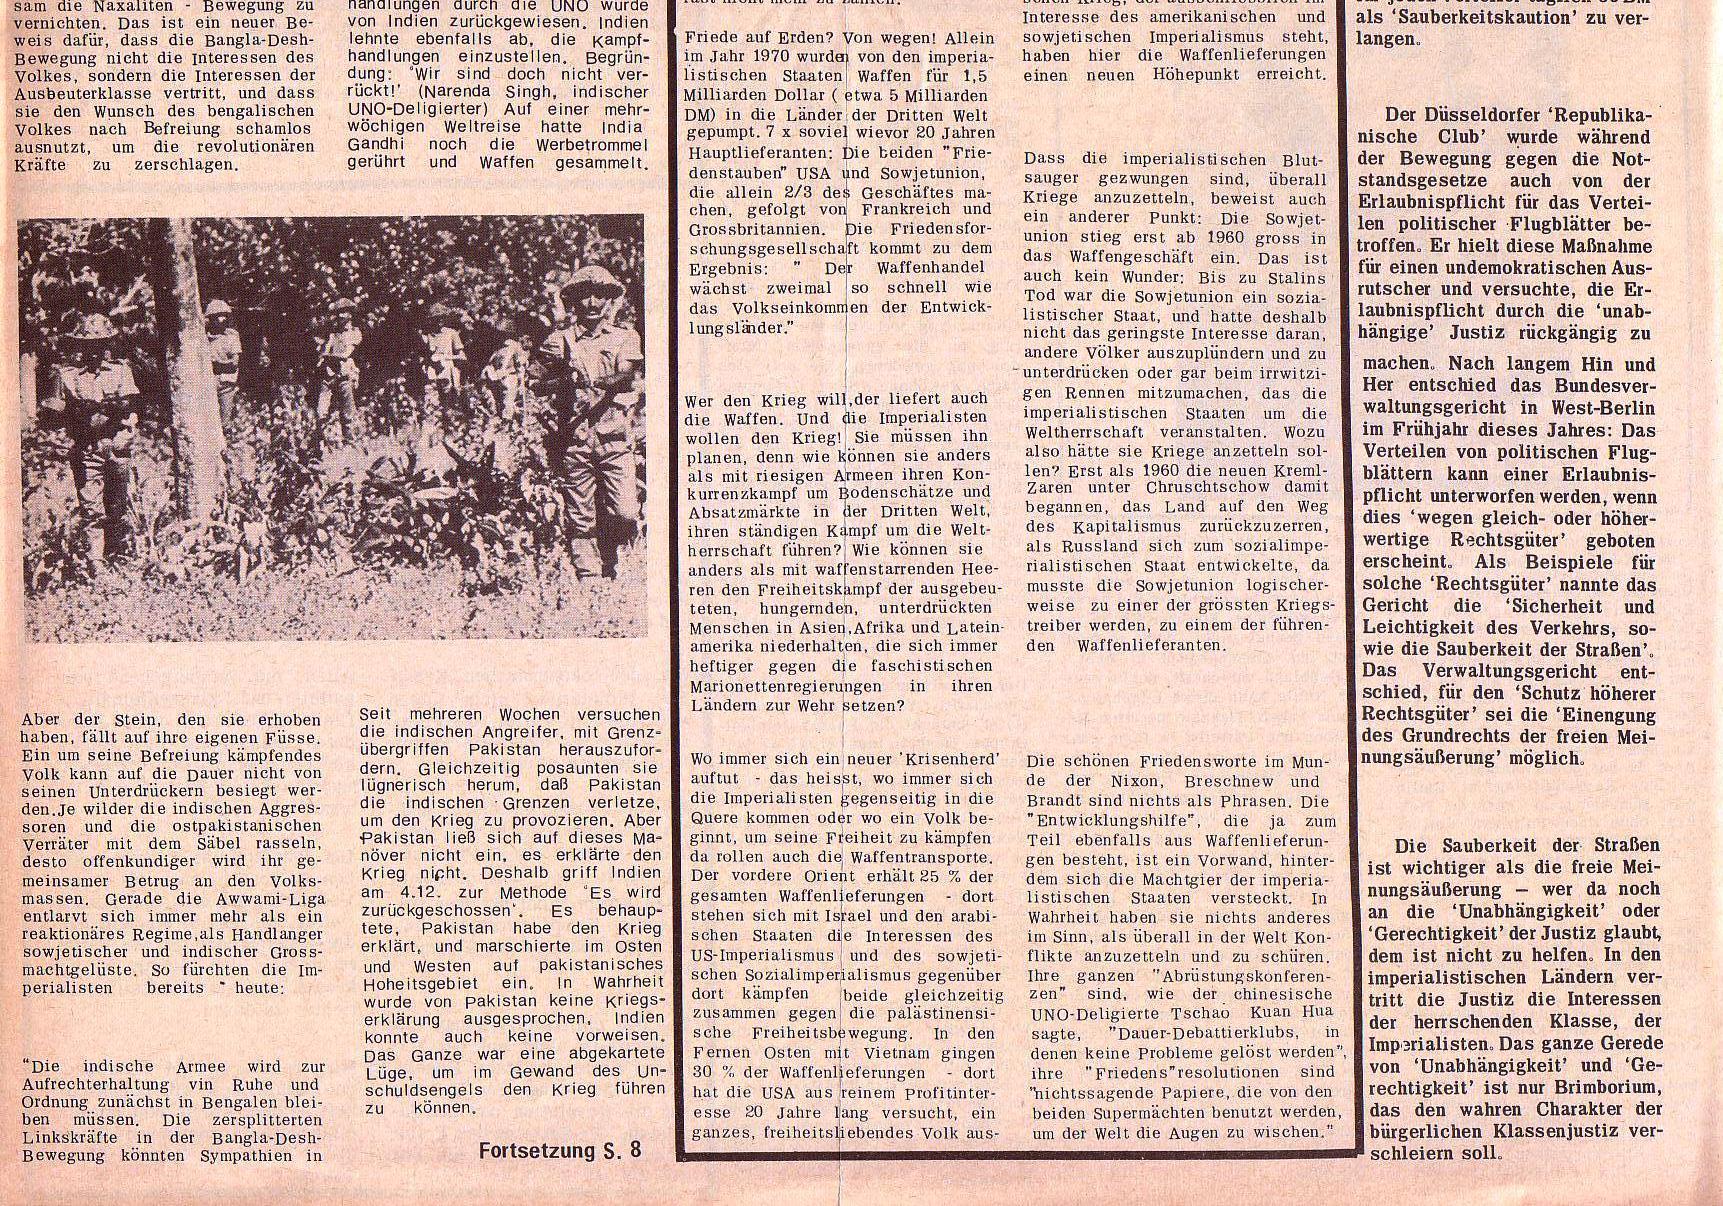 Roter Morgen, 5. Jg., 27. Dezember 1971, Nr. 16, Seite 4b